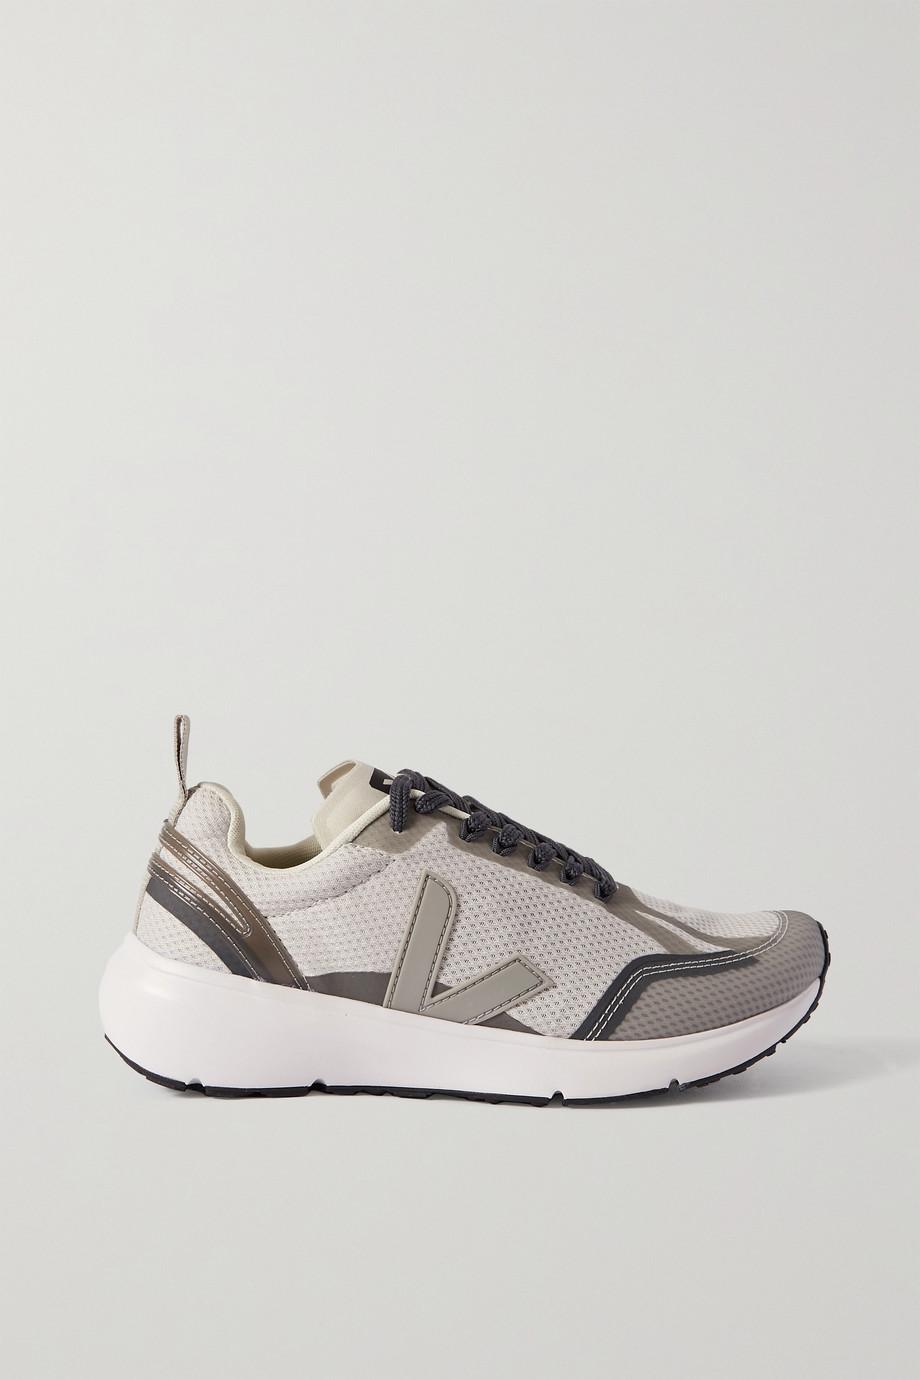 Veja + NET SUSTAIN Condor 2 Alveomesh and jersey sneakers